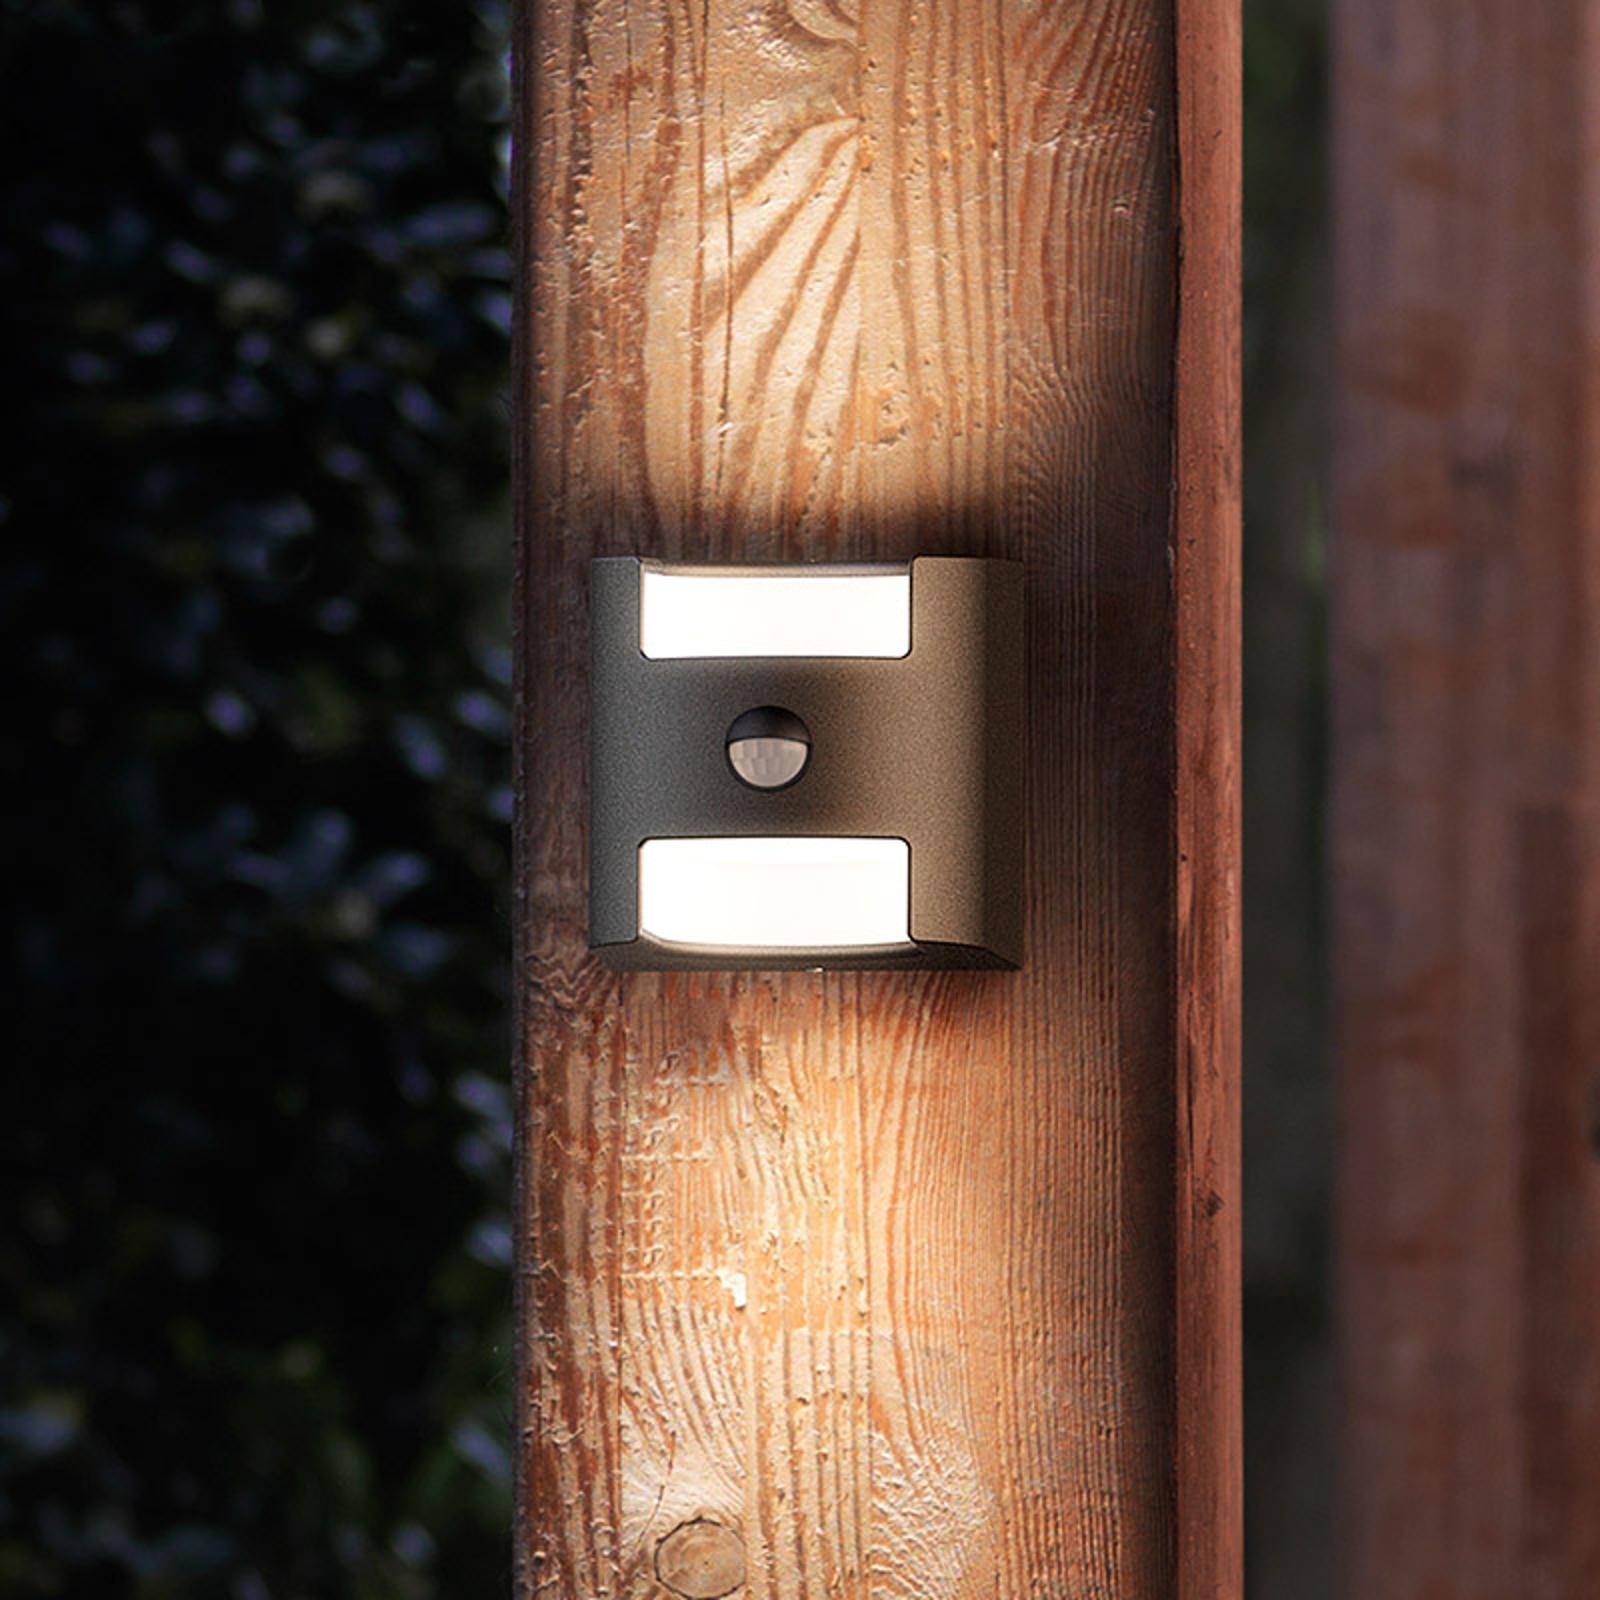 Philips Grass LED-Außenwandlampe anthrazit Sensor